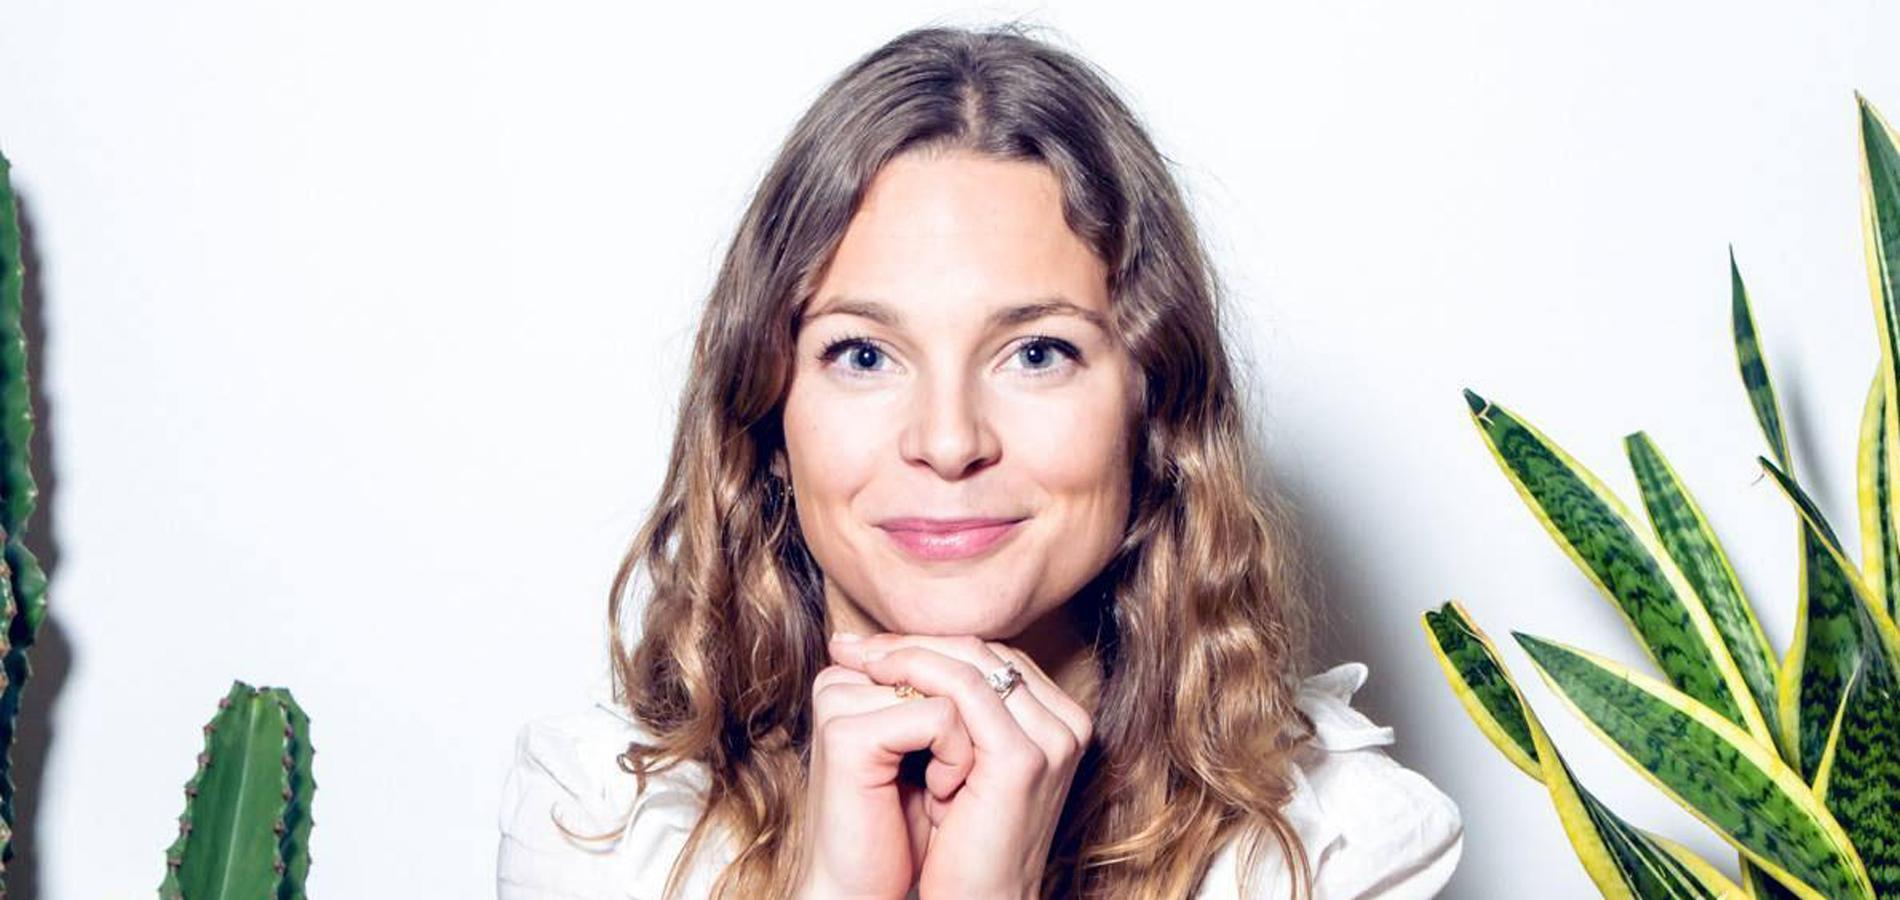 Fondatrice Face Face To De Simon La Marianna Szeib wntT1CPqCz